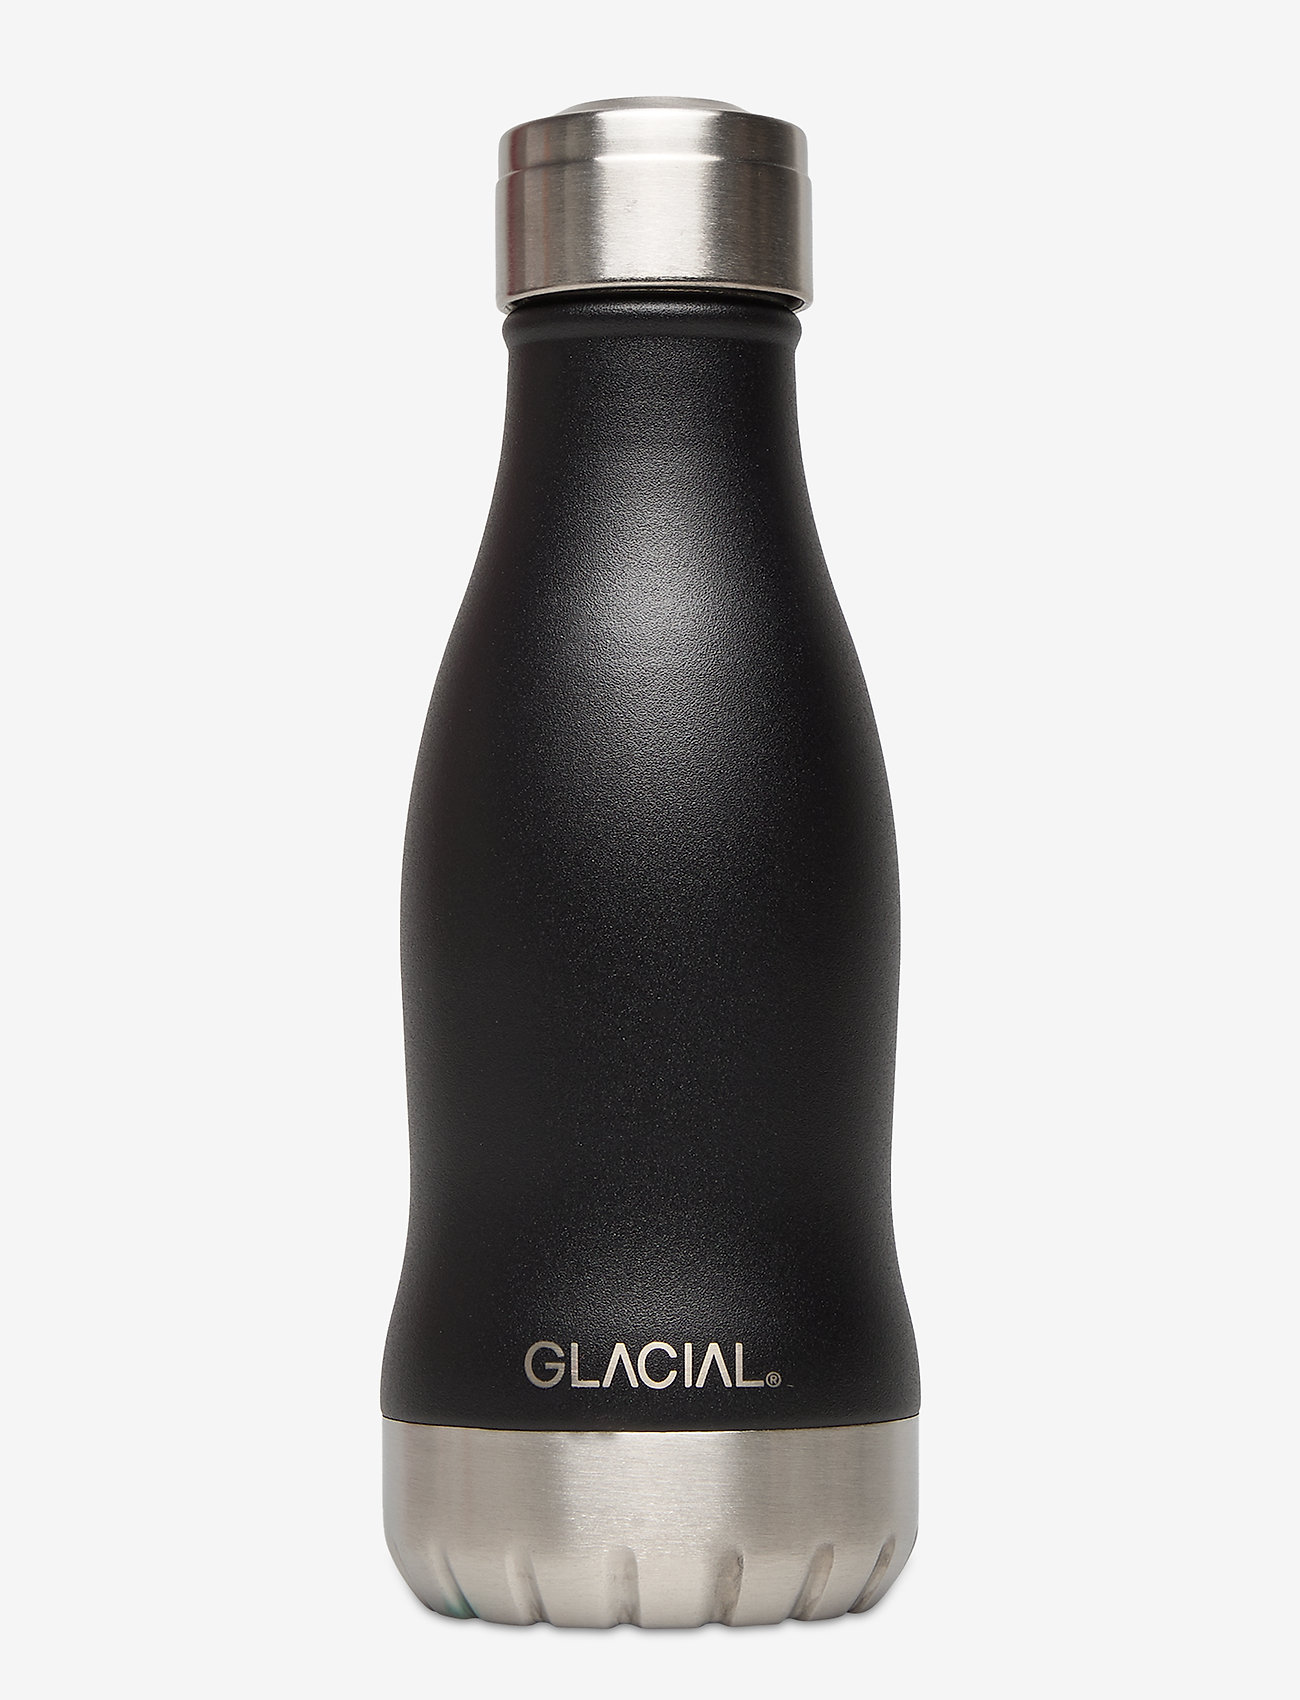 GLACIAL - Matte Black 260ml - pullot & termospullot - matte black - 0